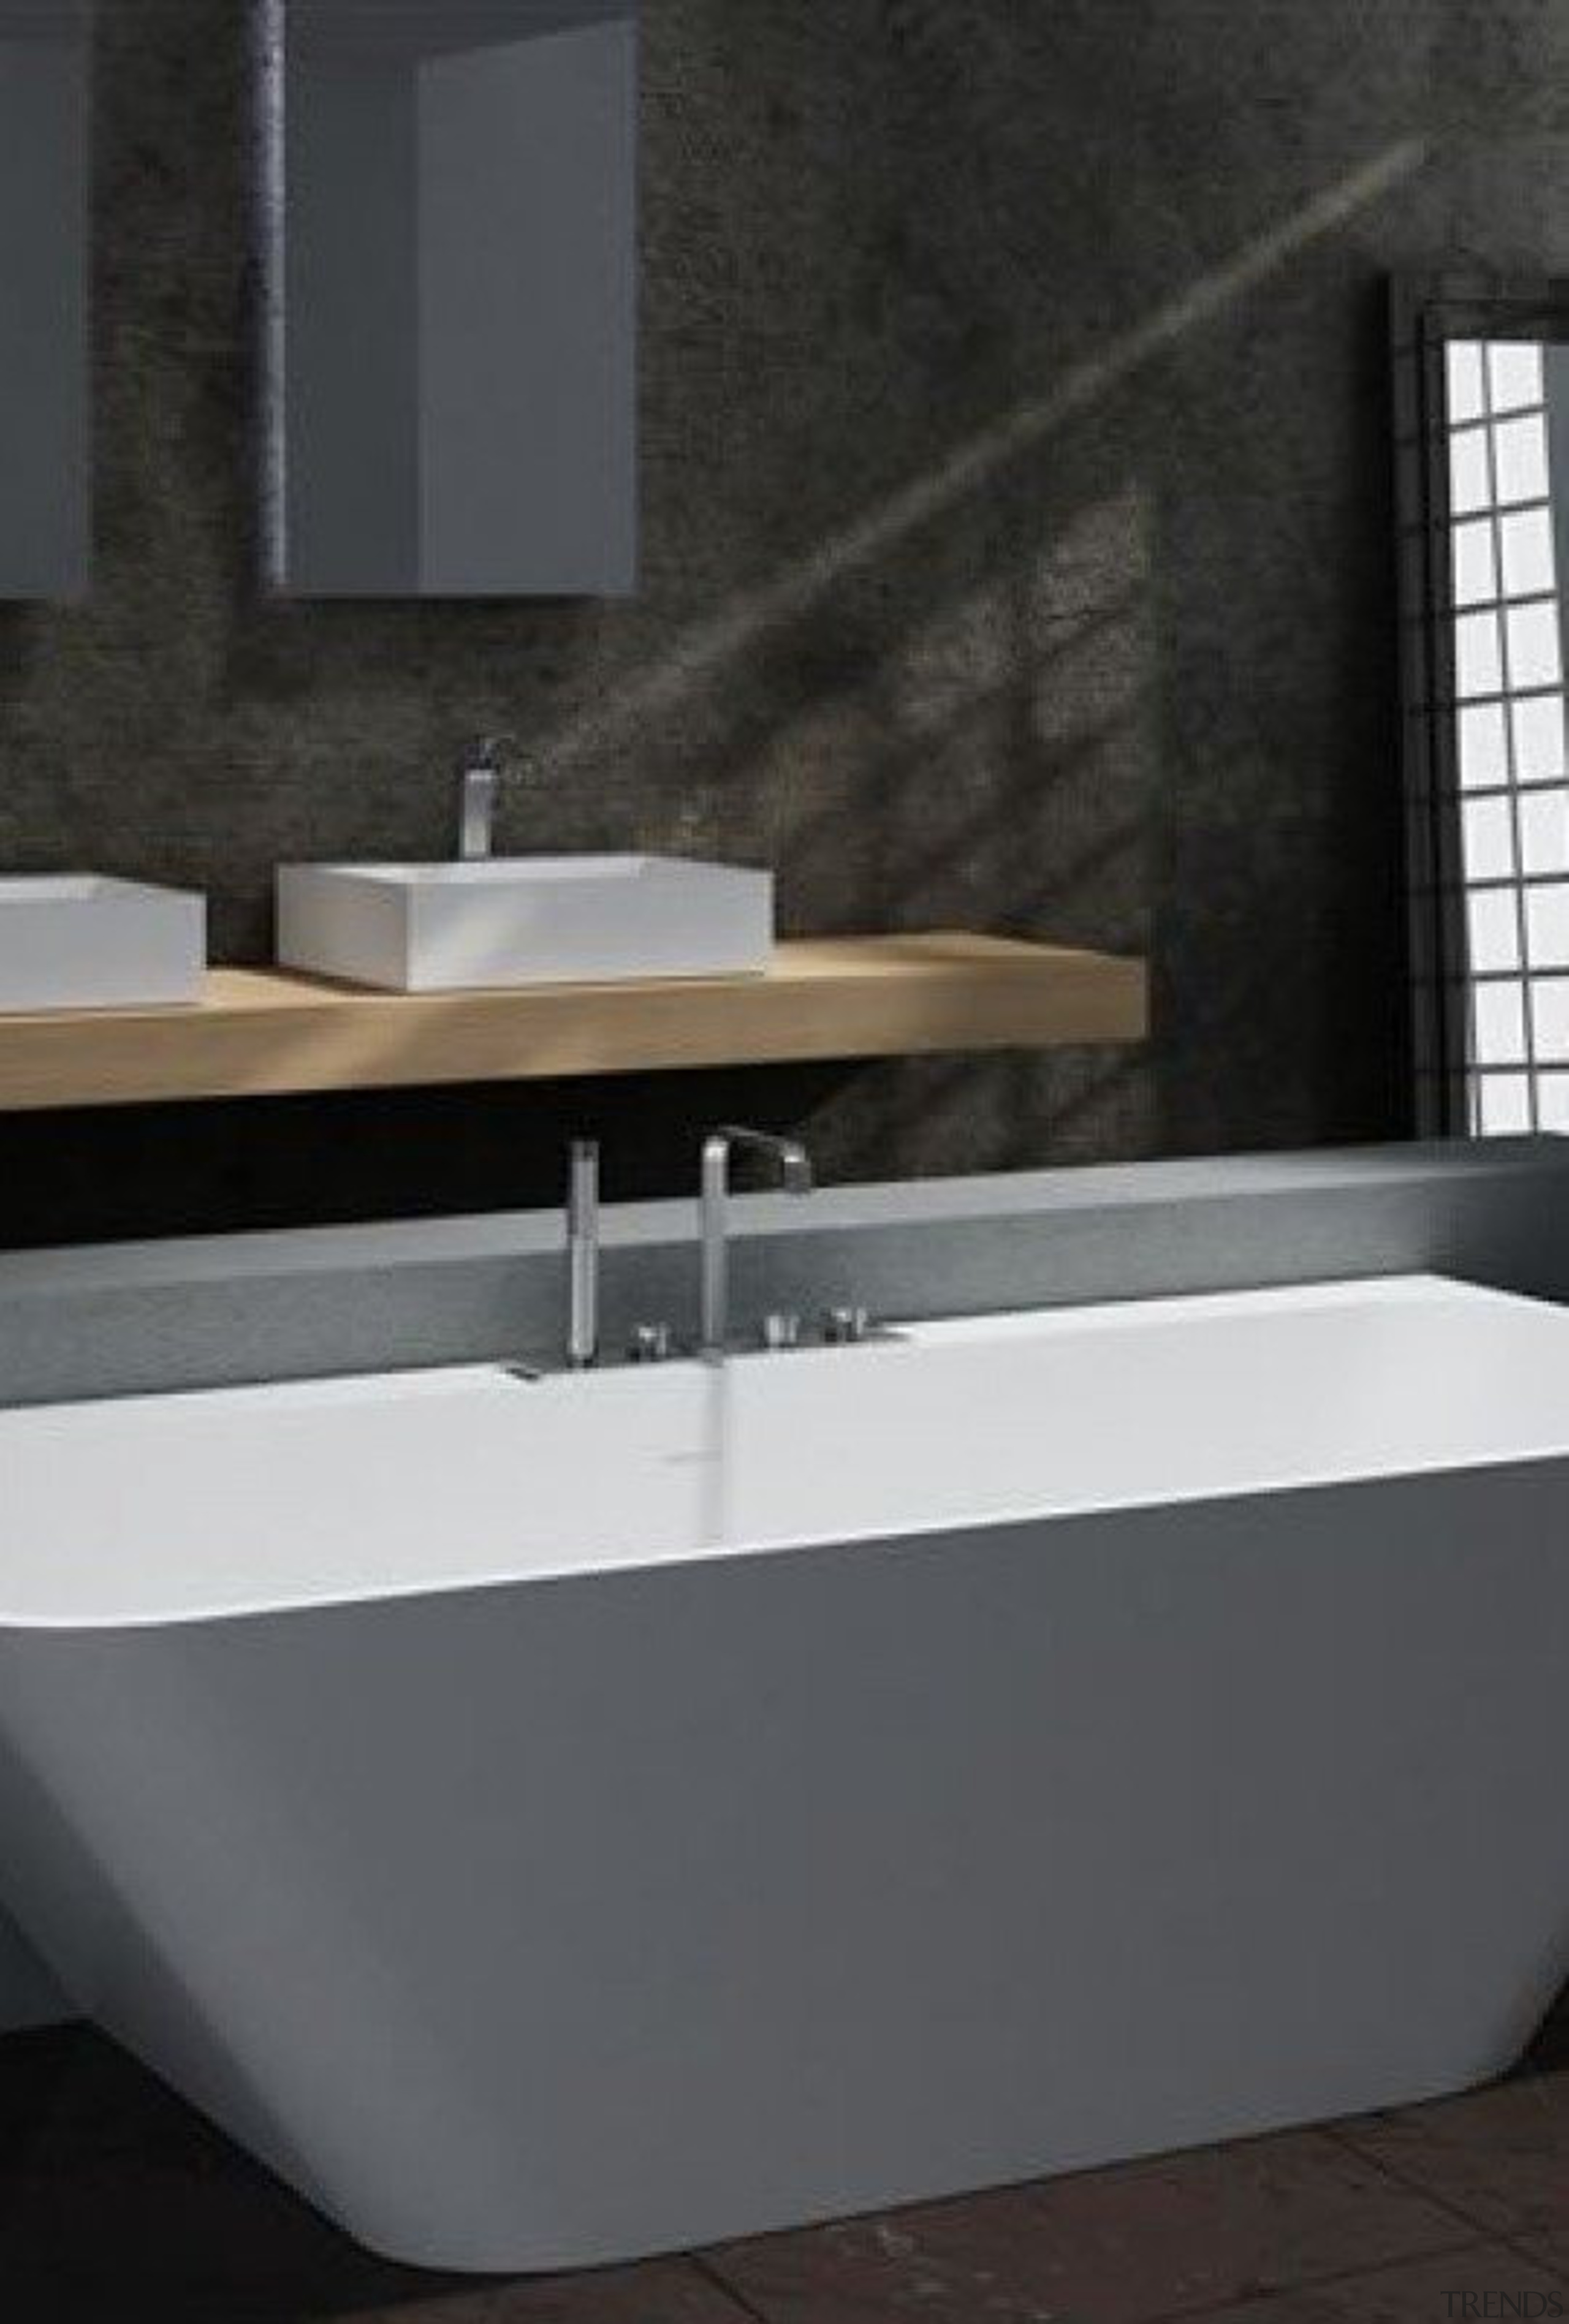 Rubino - angle   bathroom   bathroom sink angle, bathroom, bathroom sink, bathtub, floor, interior design, plumbing fixture, product design, sink, tap, black, gray